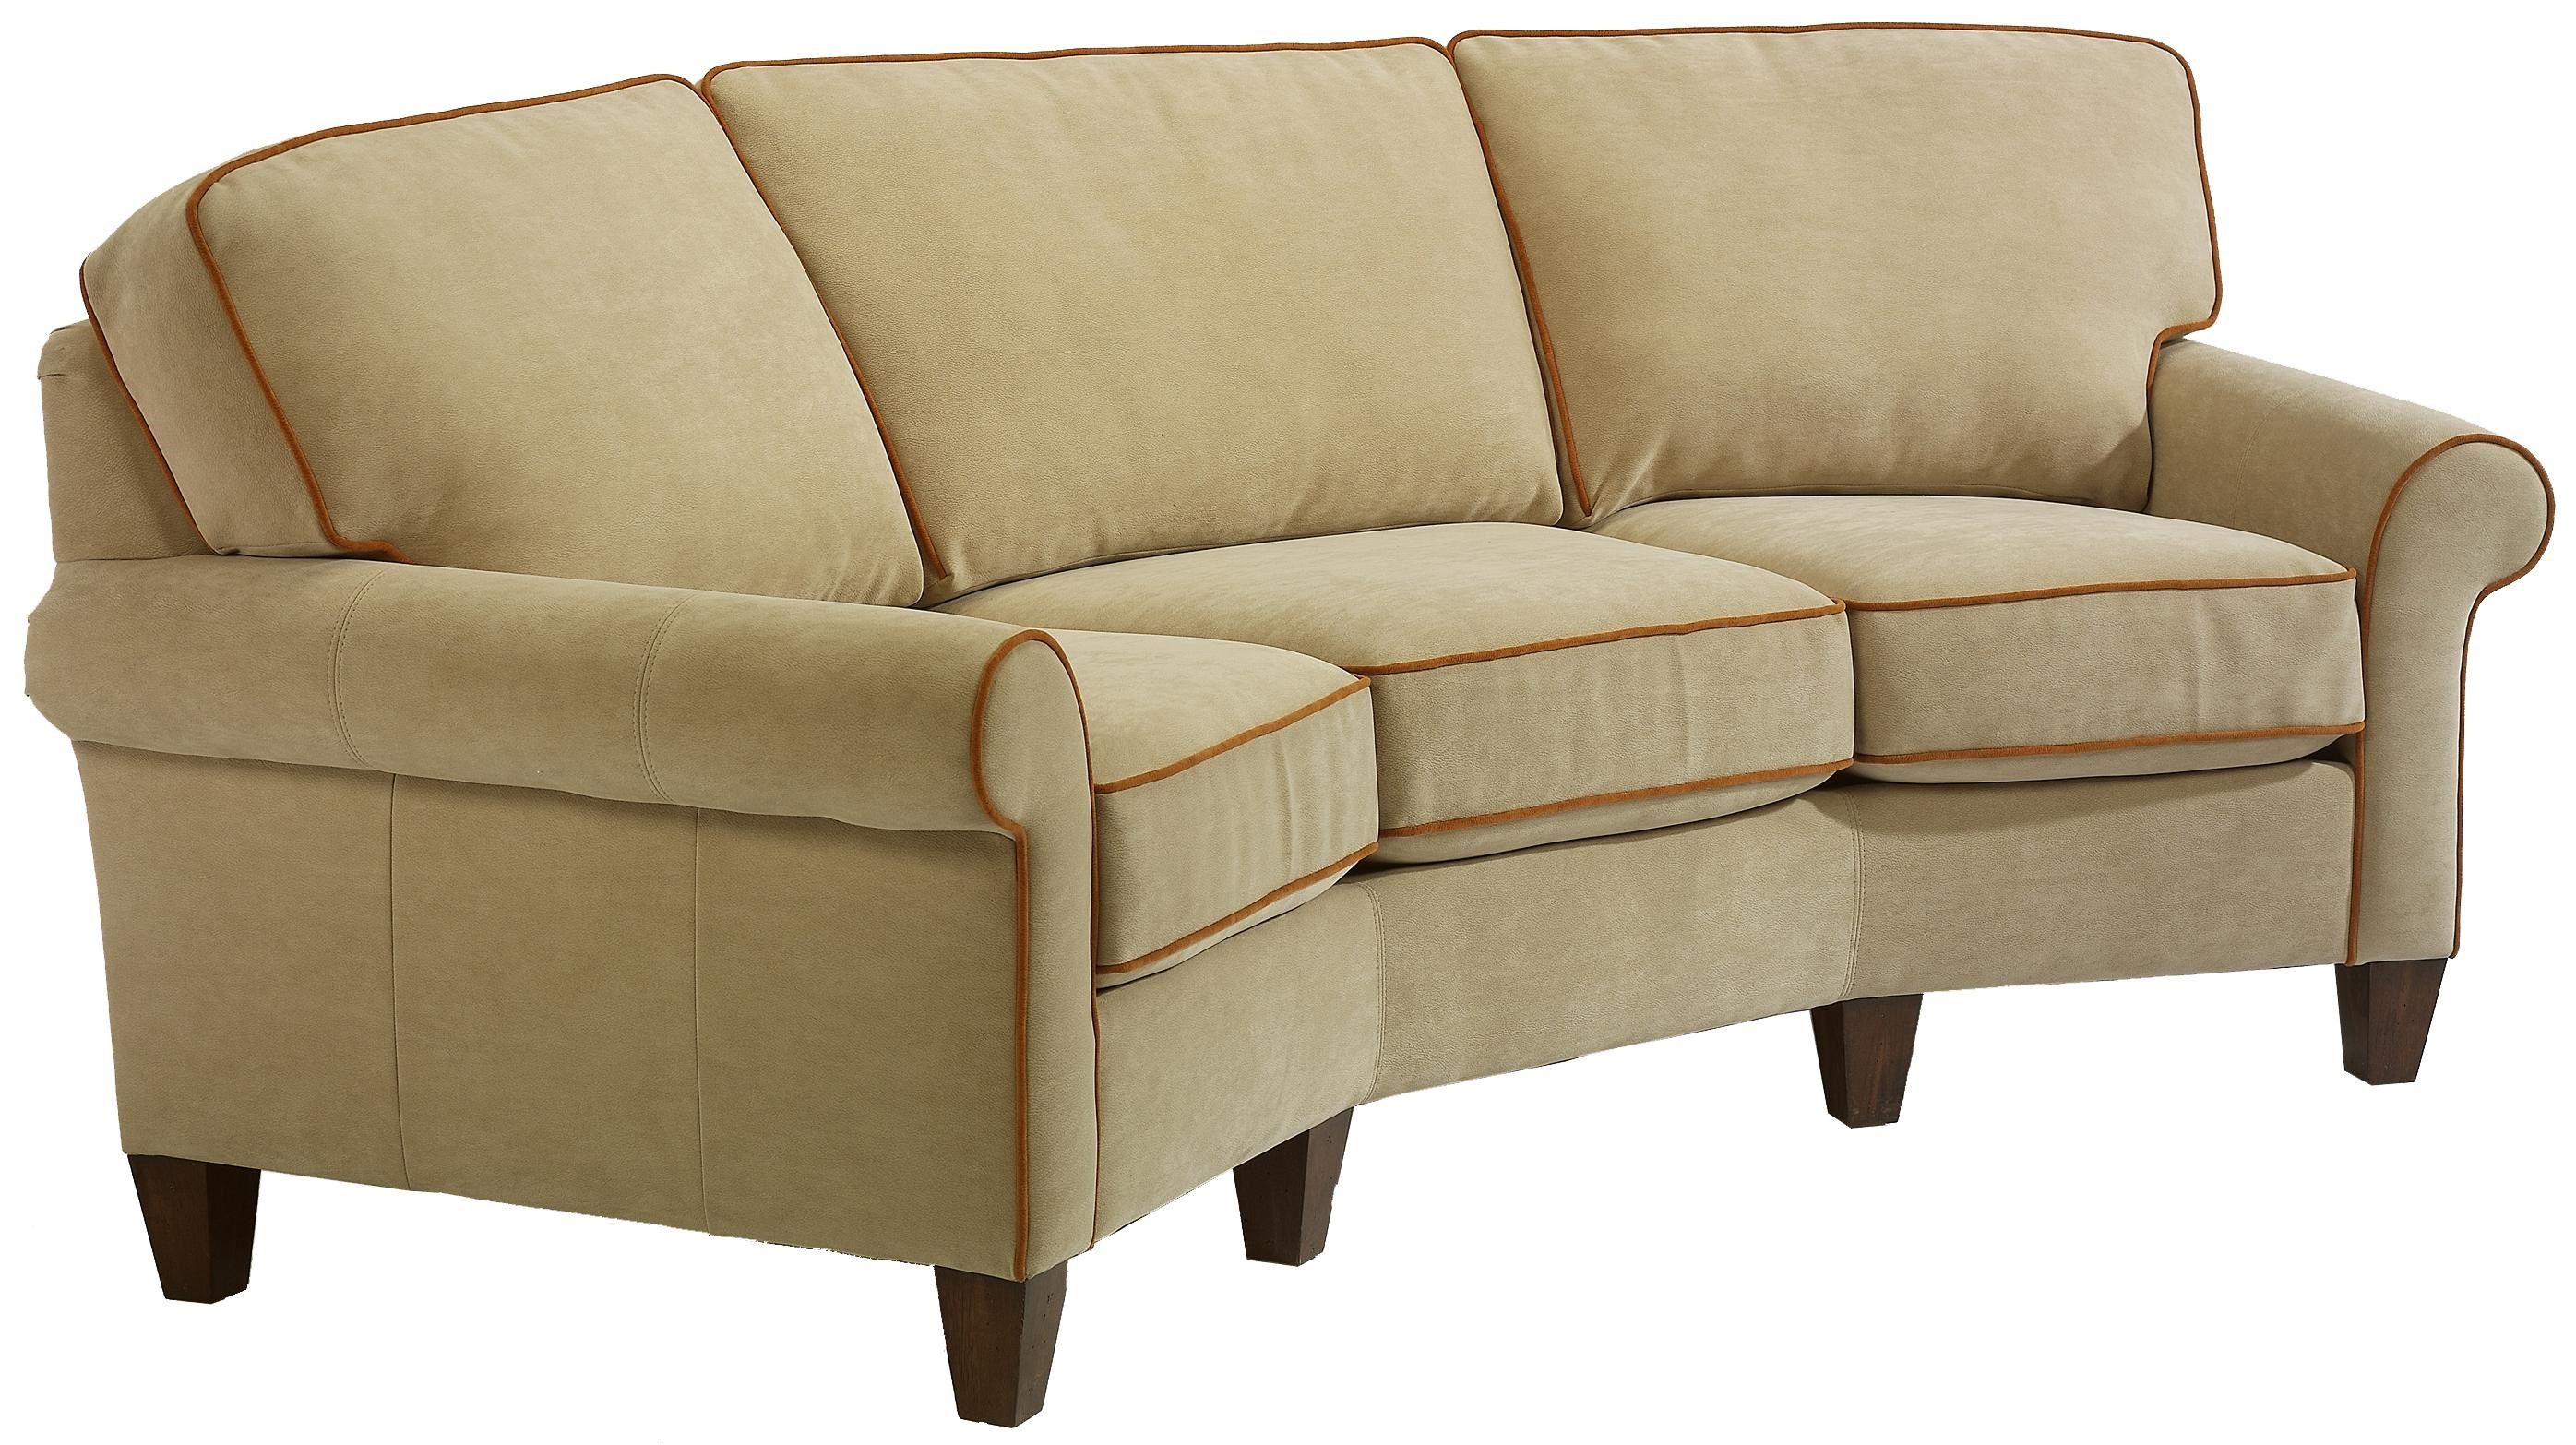 Flexsteel Westside Casual Conversation Sofa